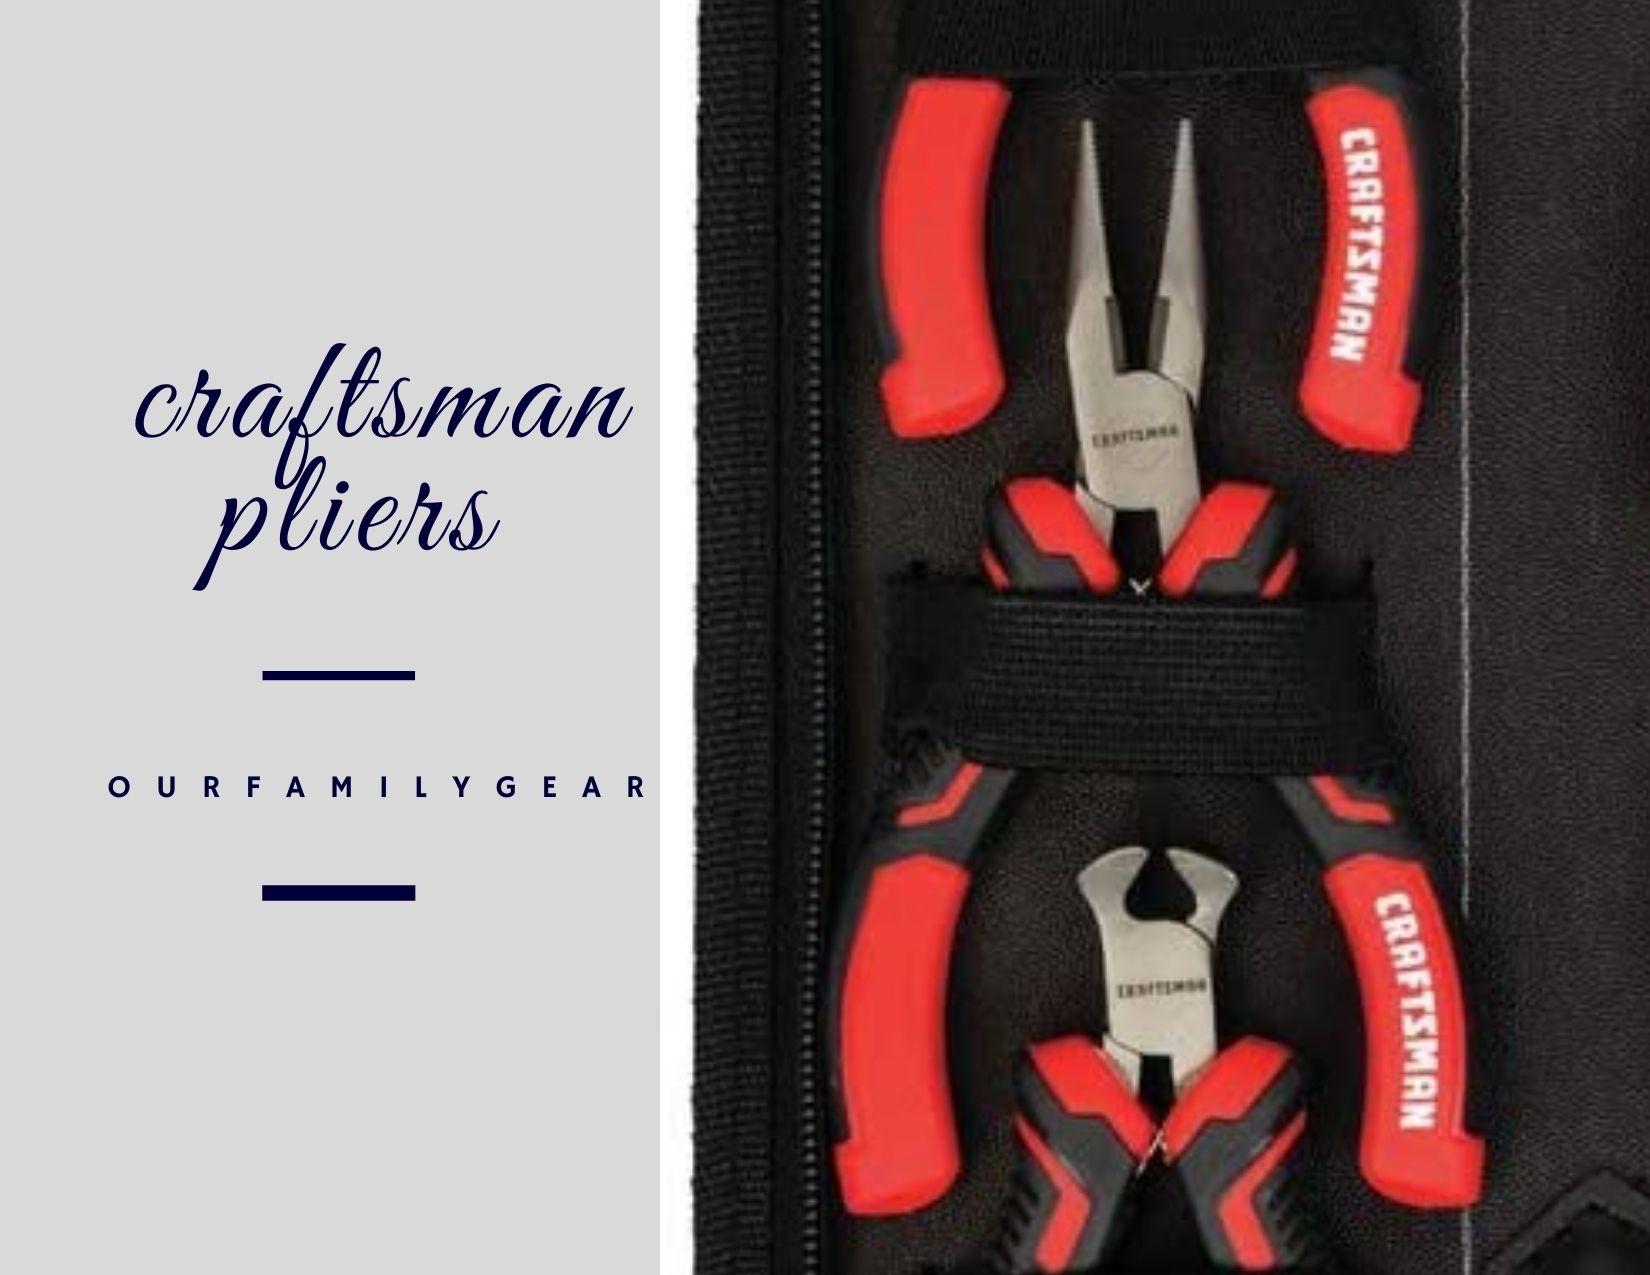 craftsman pliers (1)